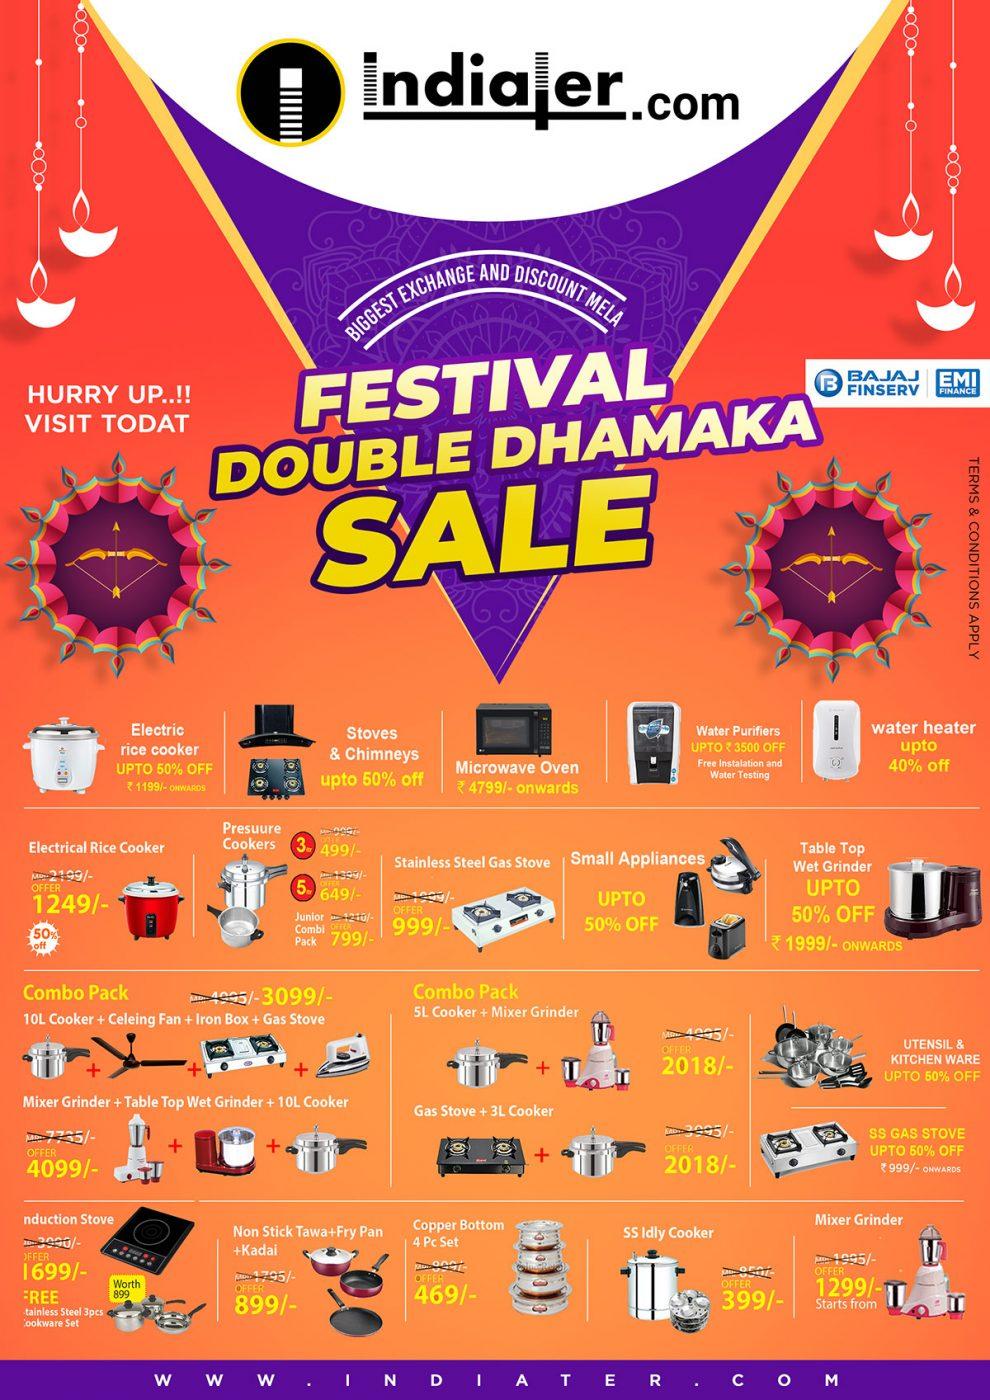 Diwali Festival double dhamaka sale customizable Poster PSD